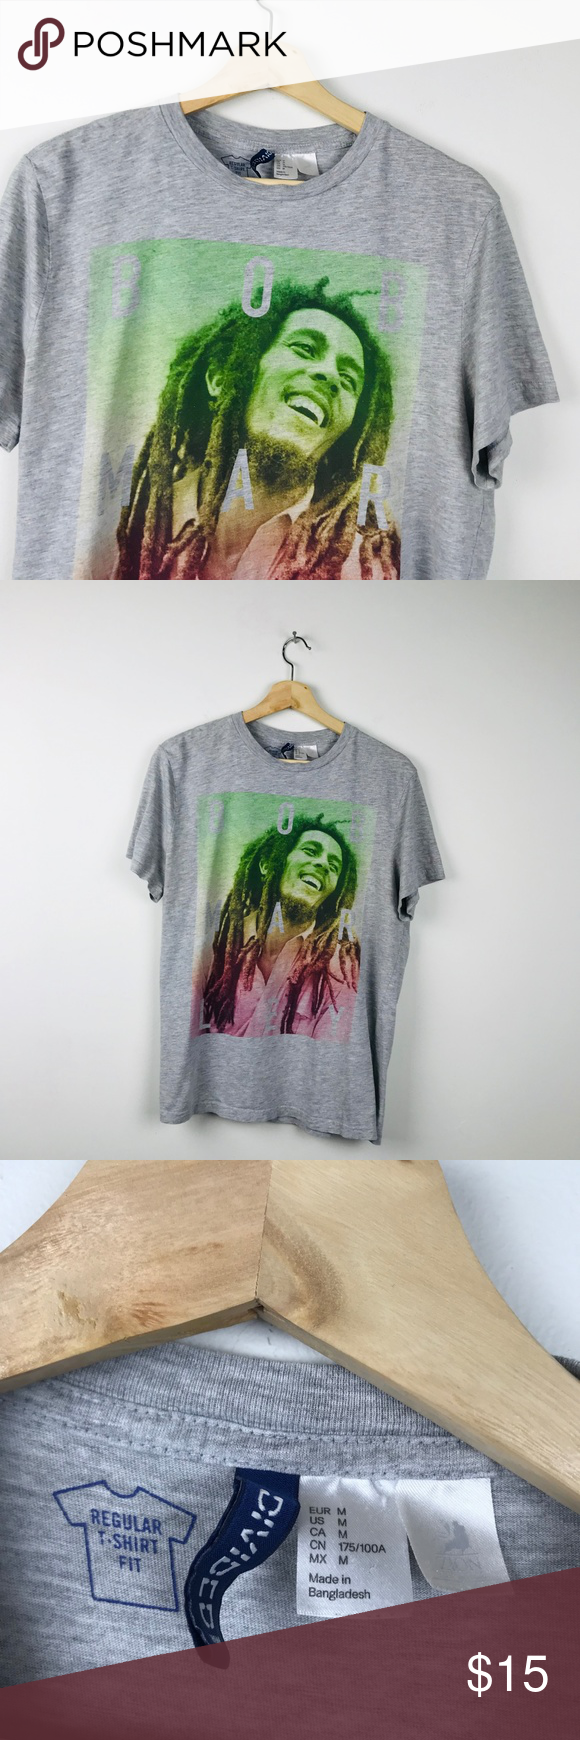 Bob Marley Rasta Short Sleeve Graphic Tee M Graphic Tees Tees Short Sleeve